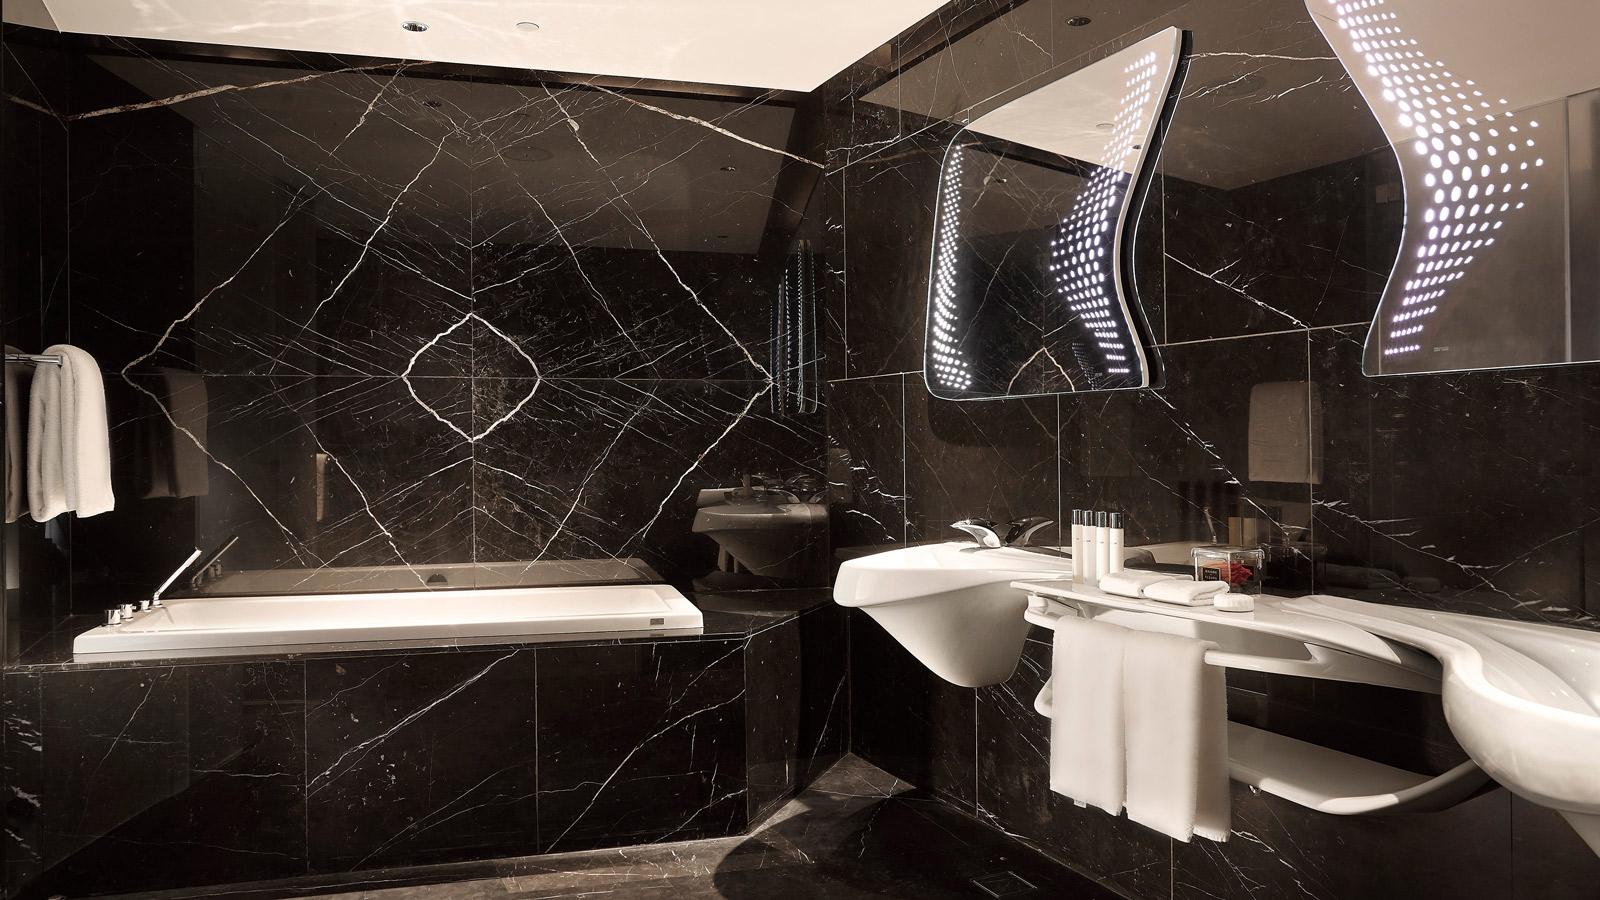 opt.Hotel Dubai Me by Melia Noken Porcelanosa Laurian Ghinitoiu 9